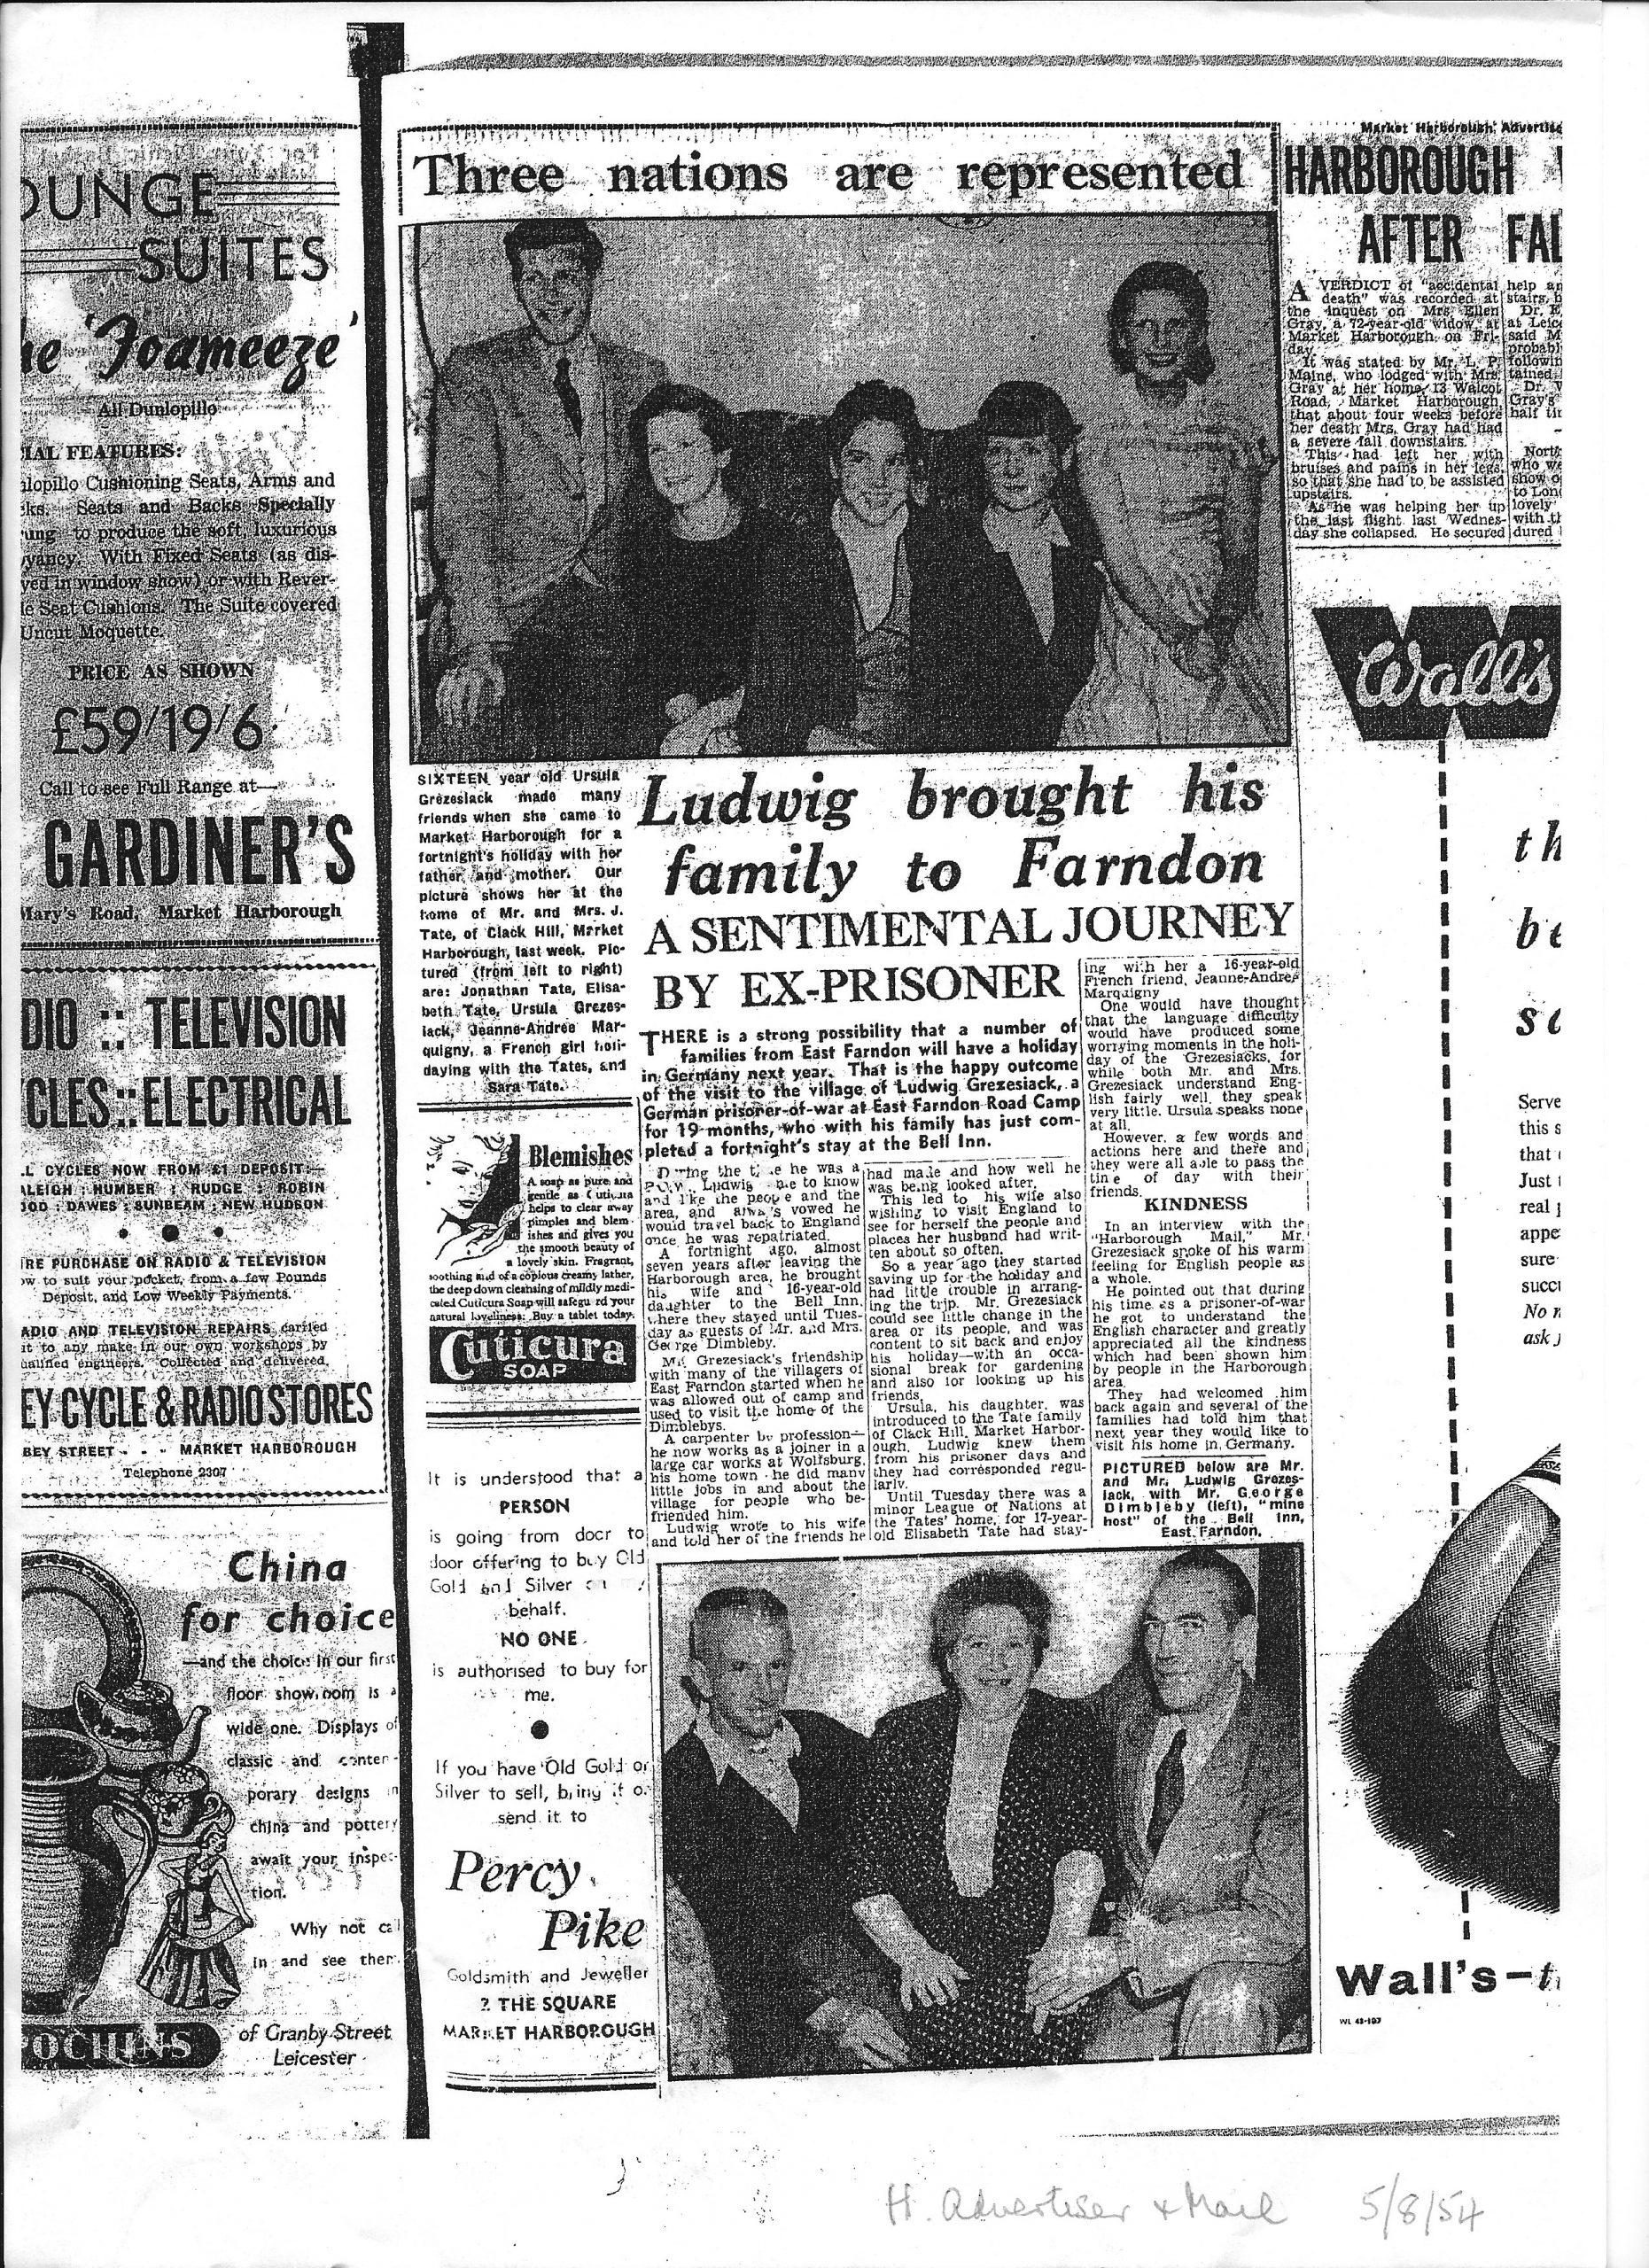 German POW Returns to East Farndon - 1954